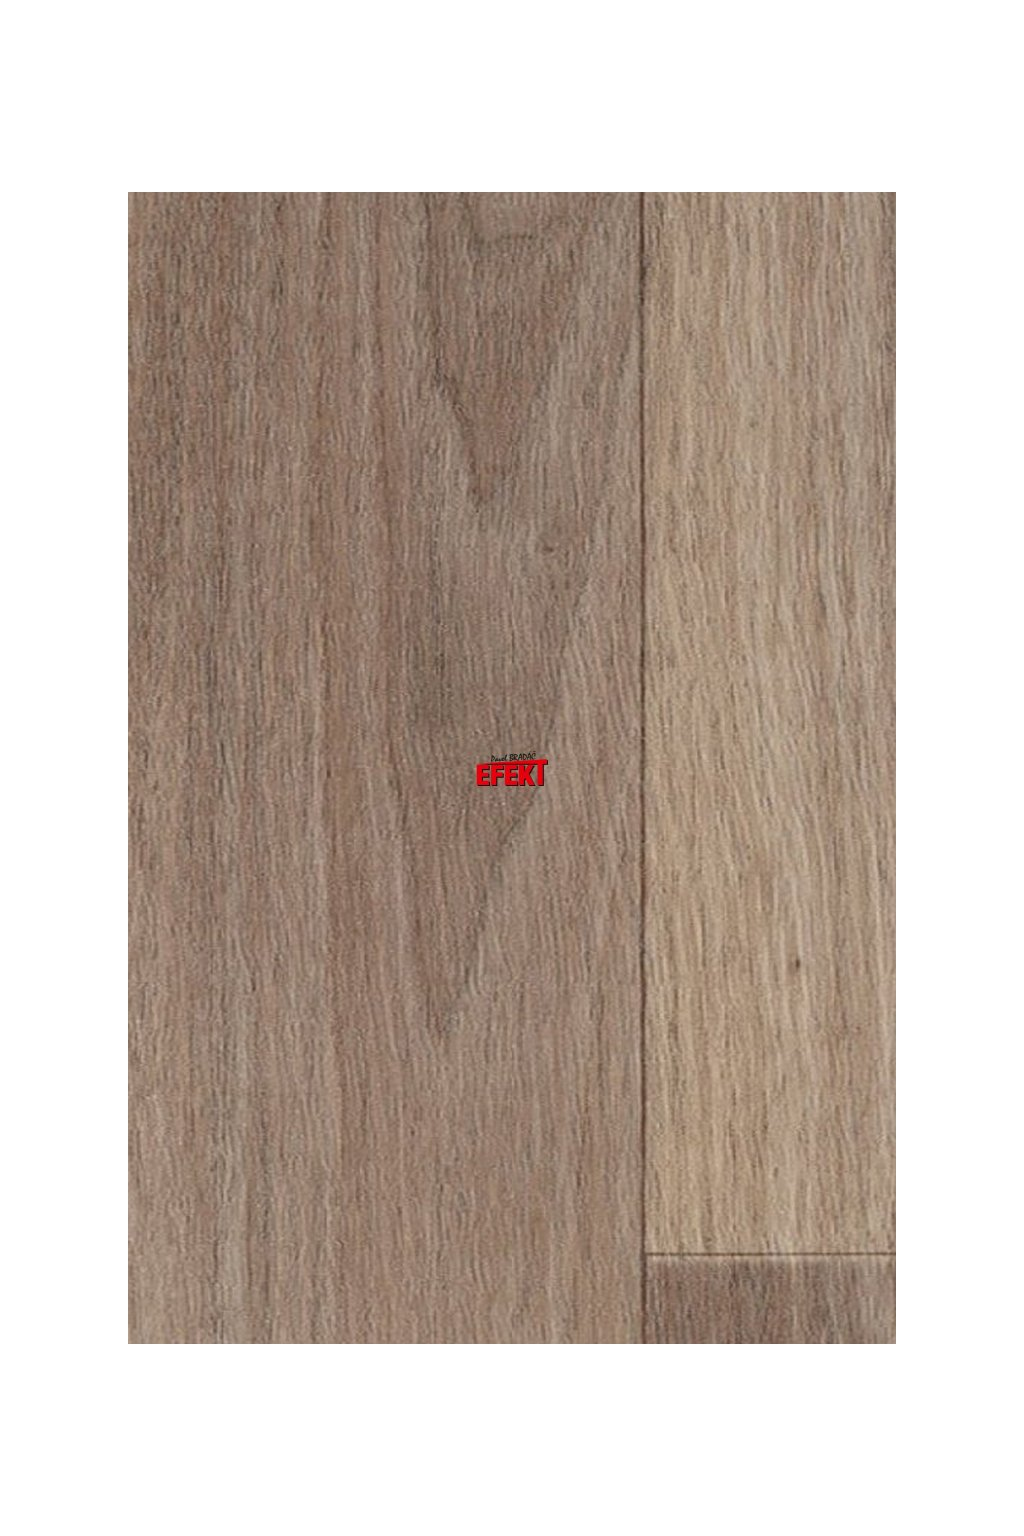 Gerflor Timberline Walnut Grey Brown 0562